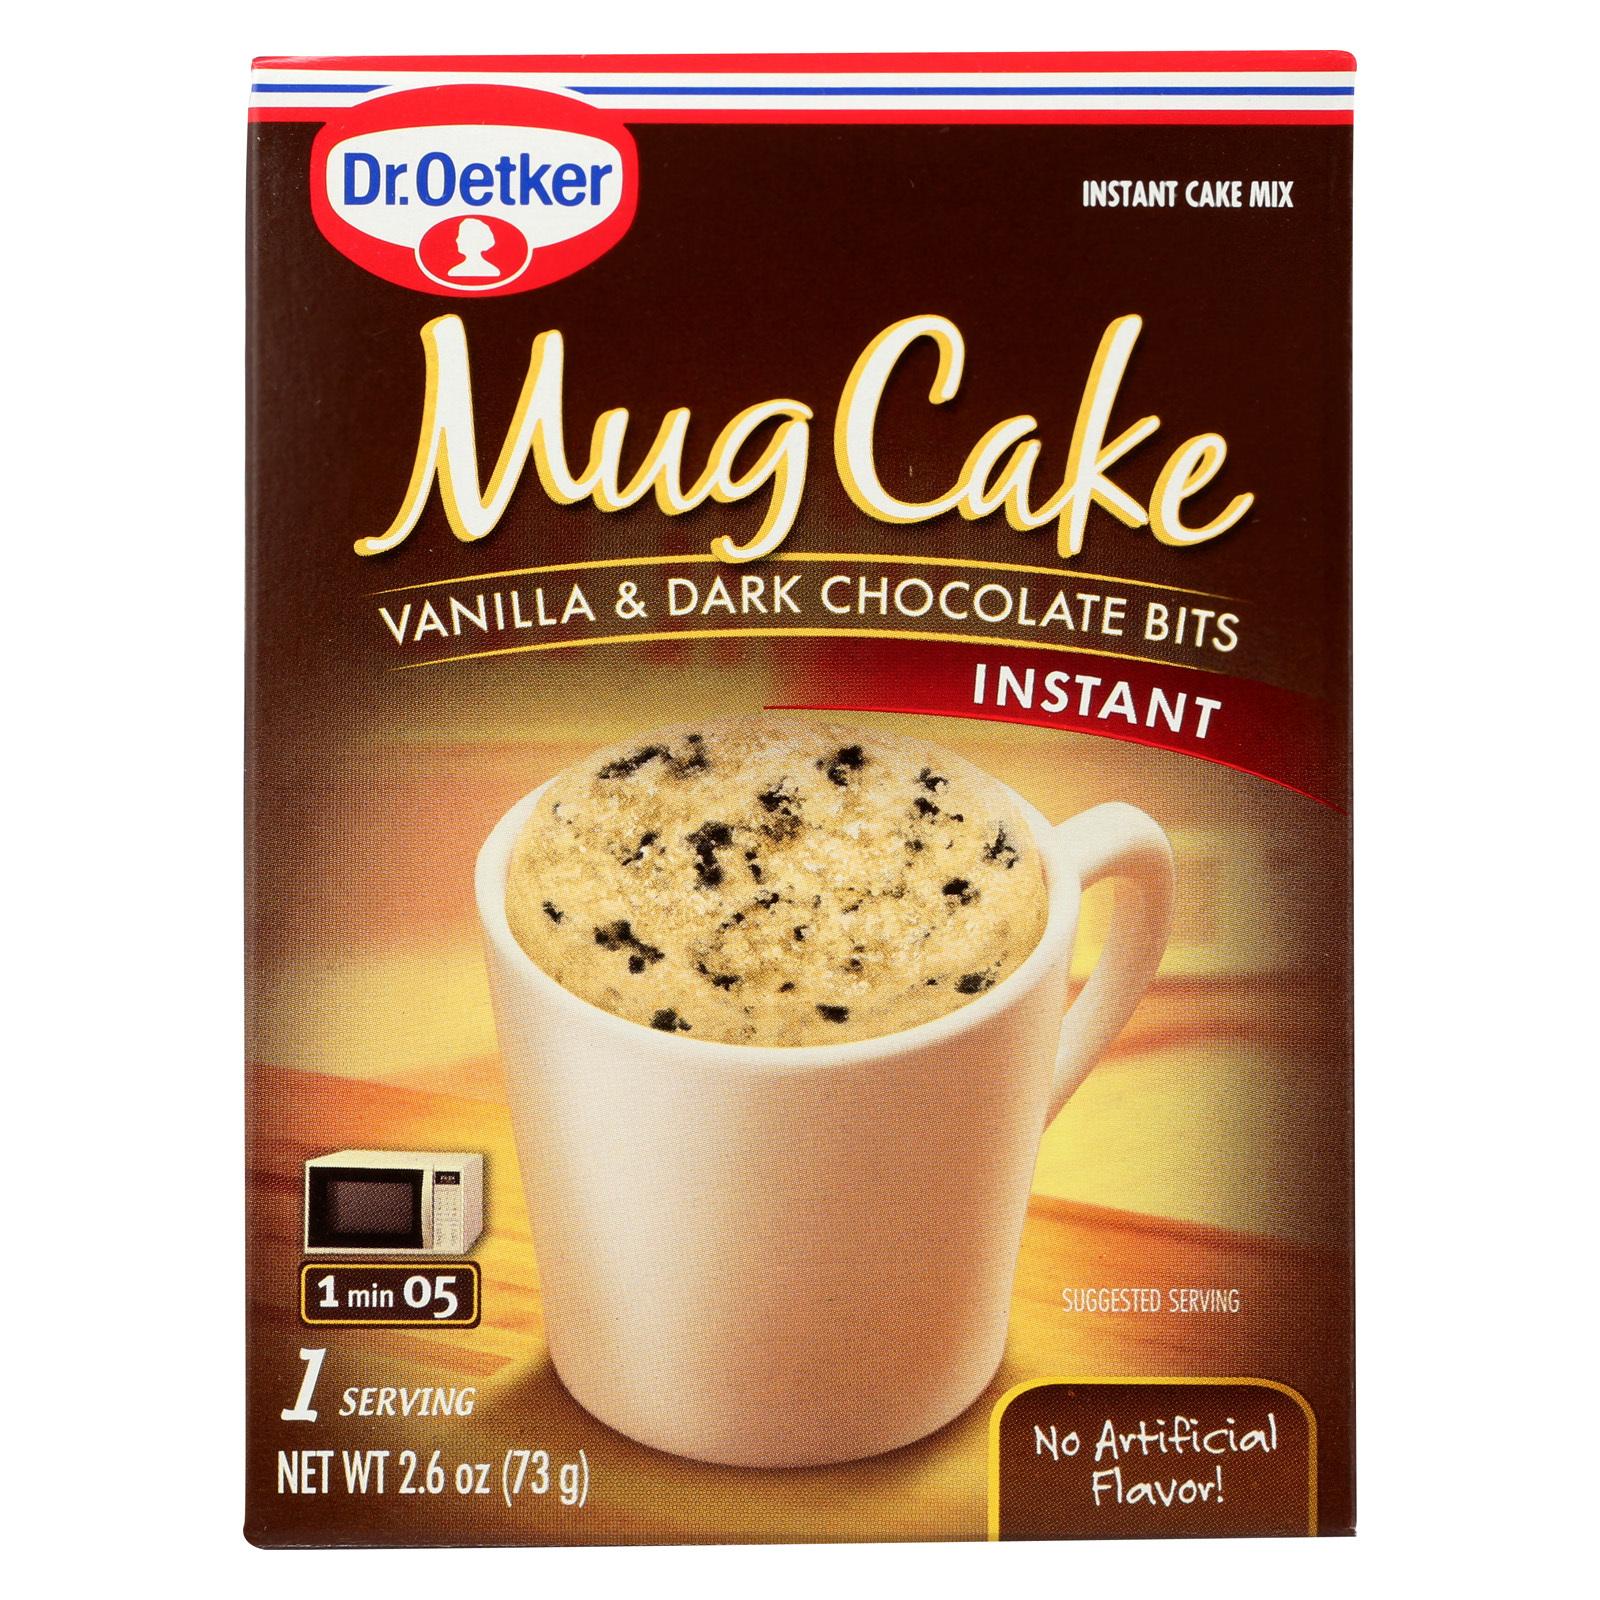 Dr. Oetker Organics Mug Cake Vanilla and Dark Chocolate Bits Instant Cake Mix - Case of 12 - 2.6 oz.